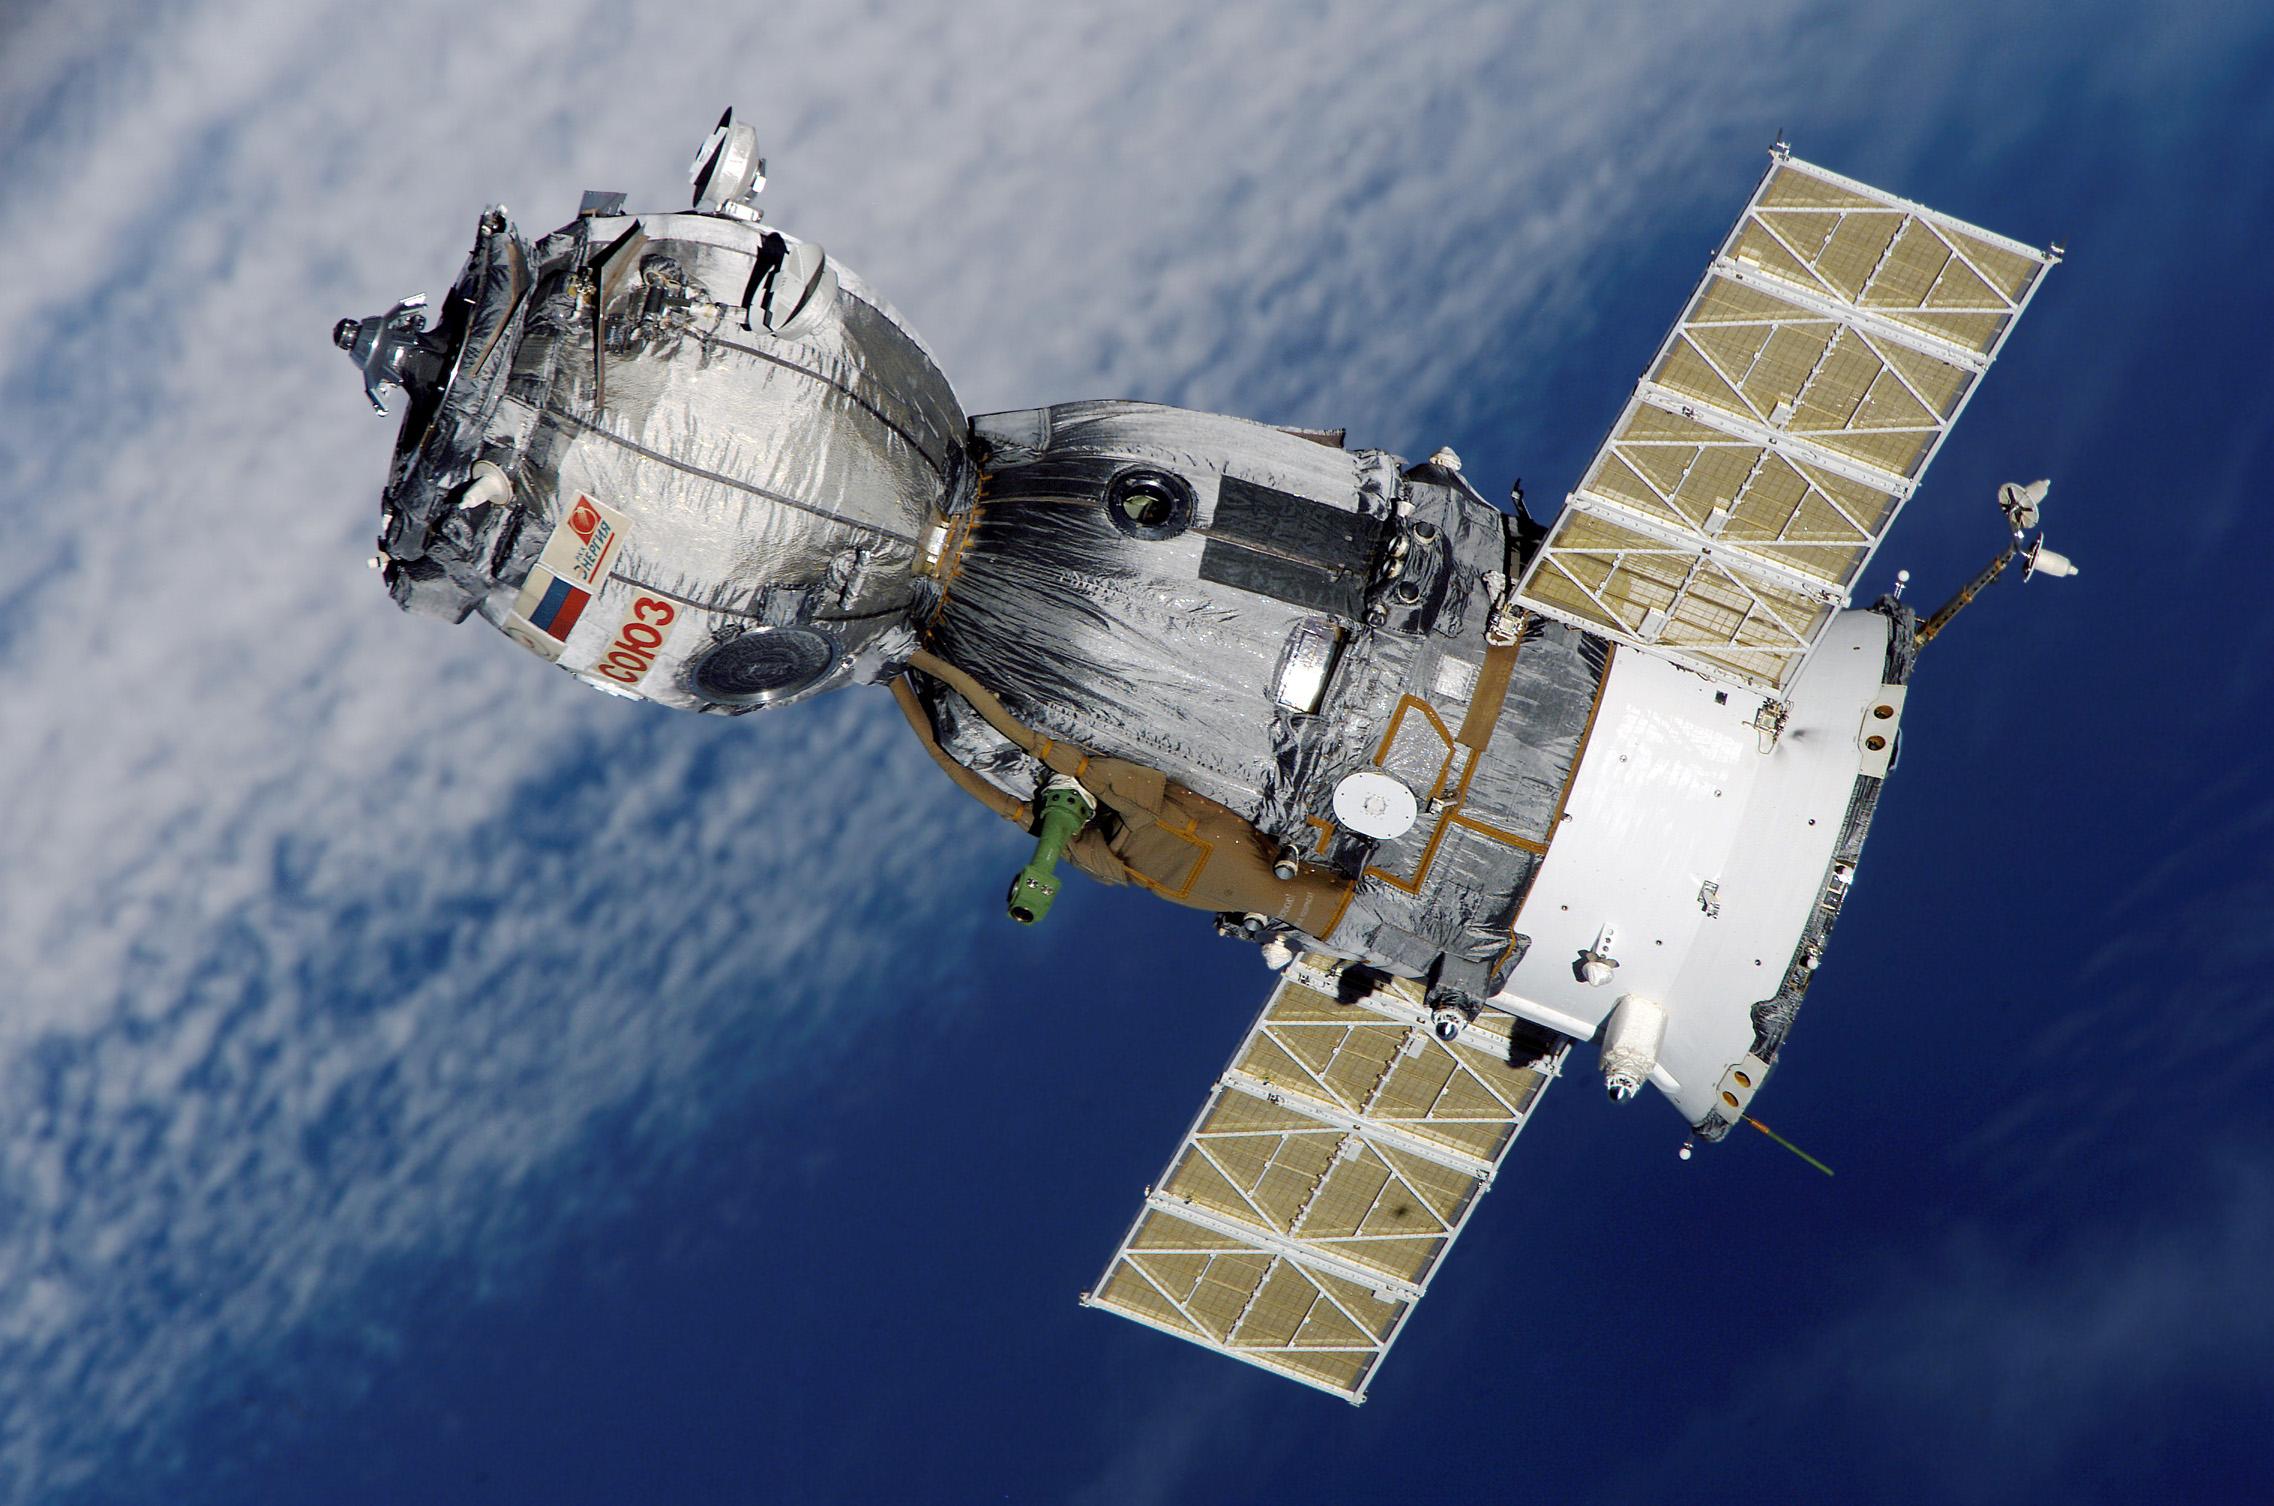 Satellite Backgrounds, Compatible - PC, Mobile, Gadgets| 2274x1506 px